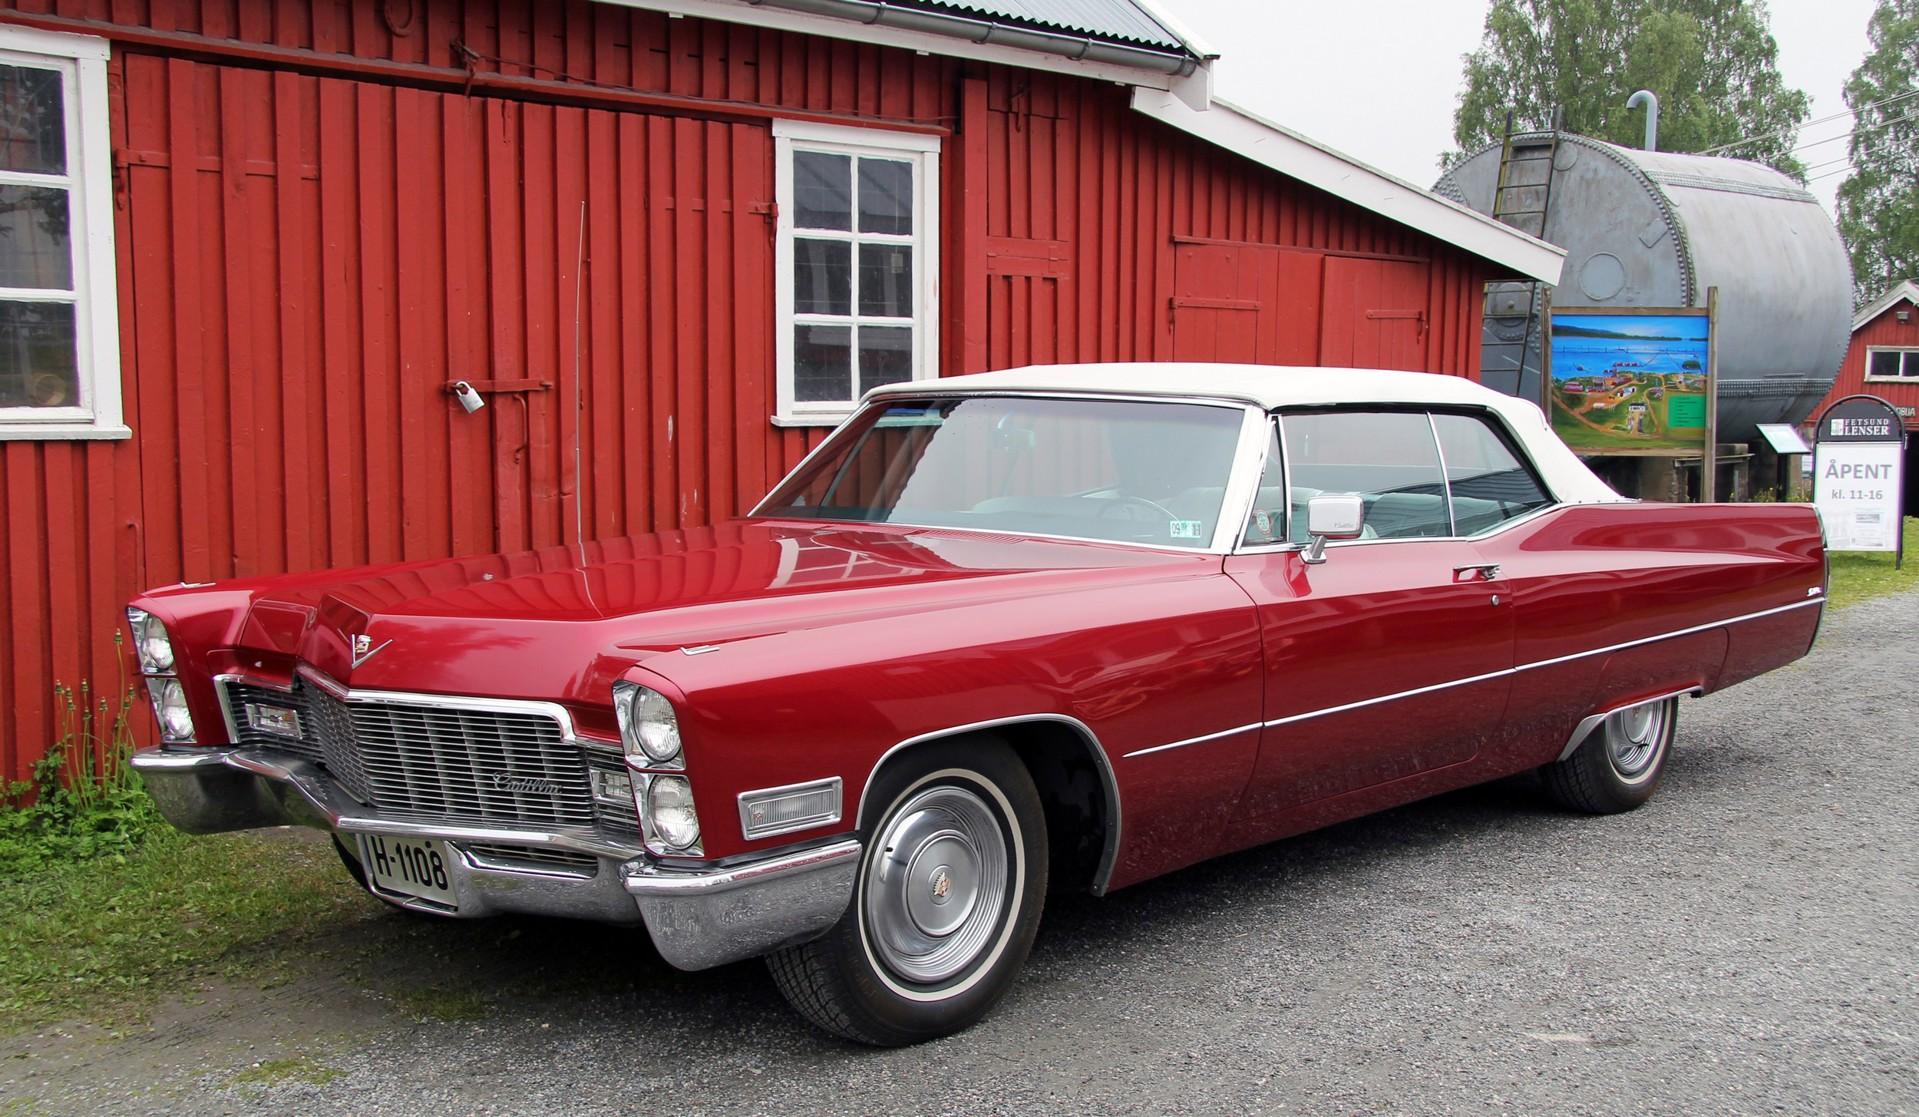 075-1968 Cadillac DeVille convertible 02. Eier- me